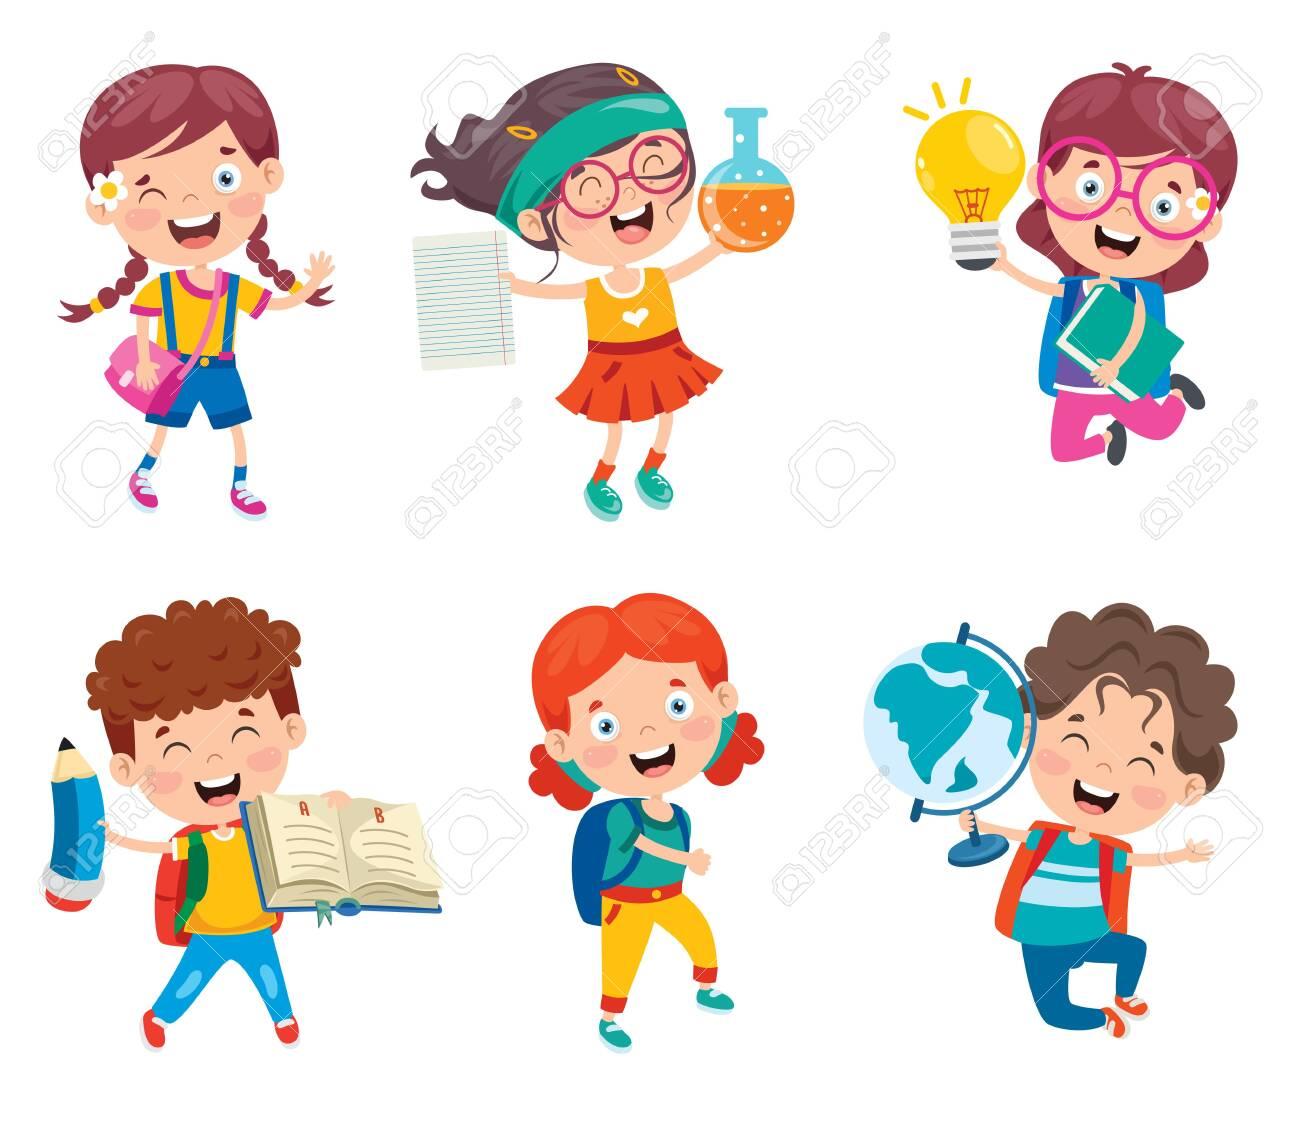 Happy Cute Cartoon School Children - 148198151